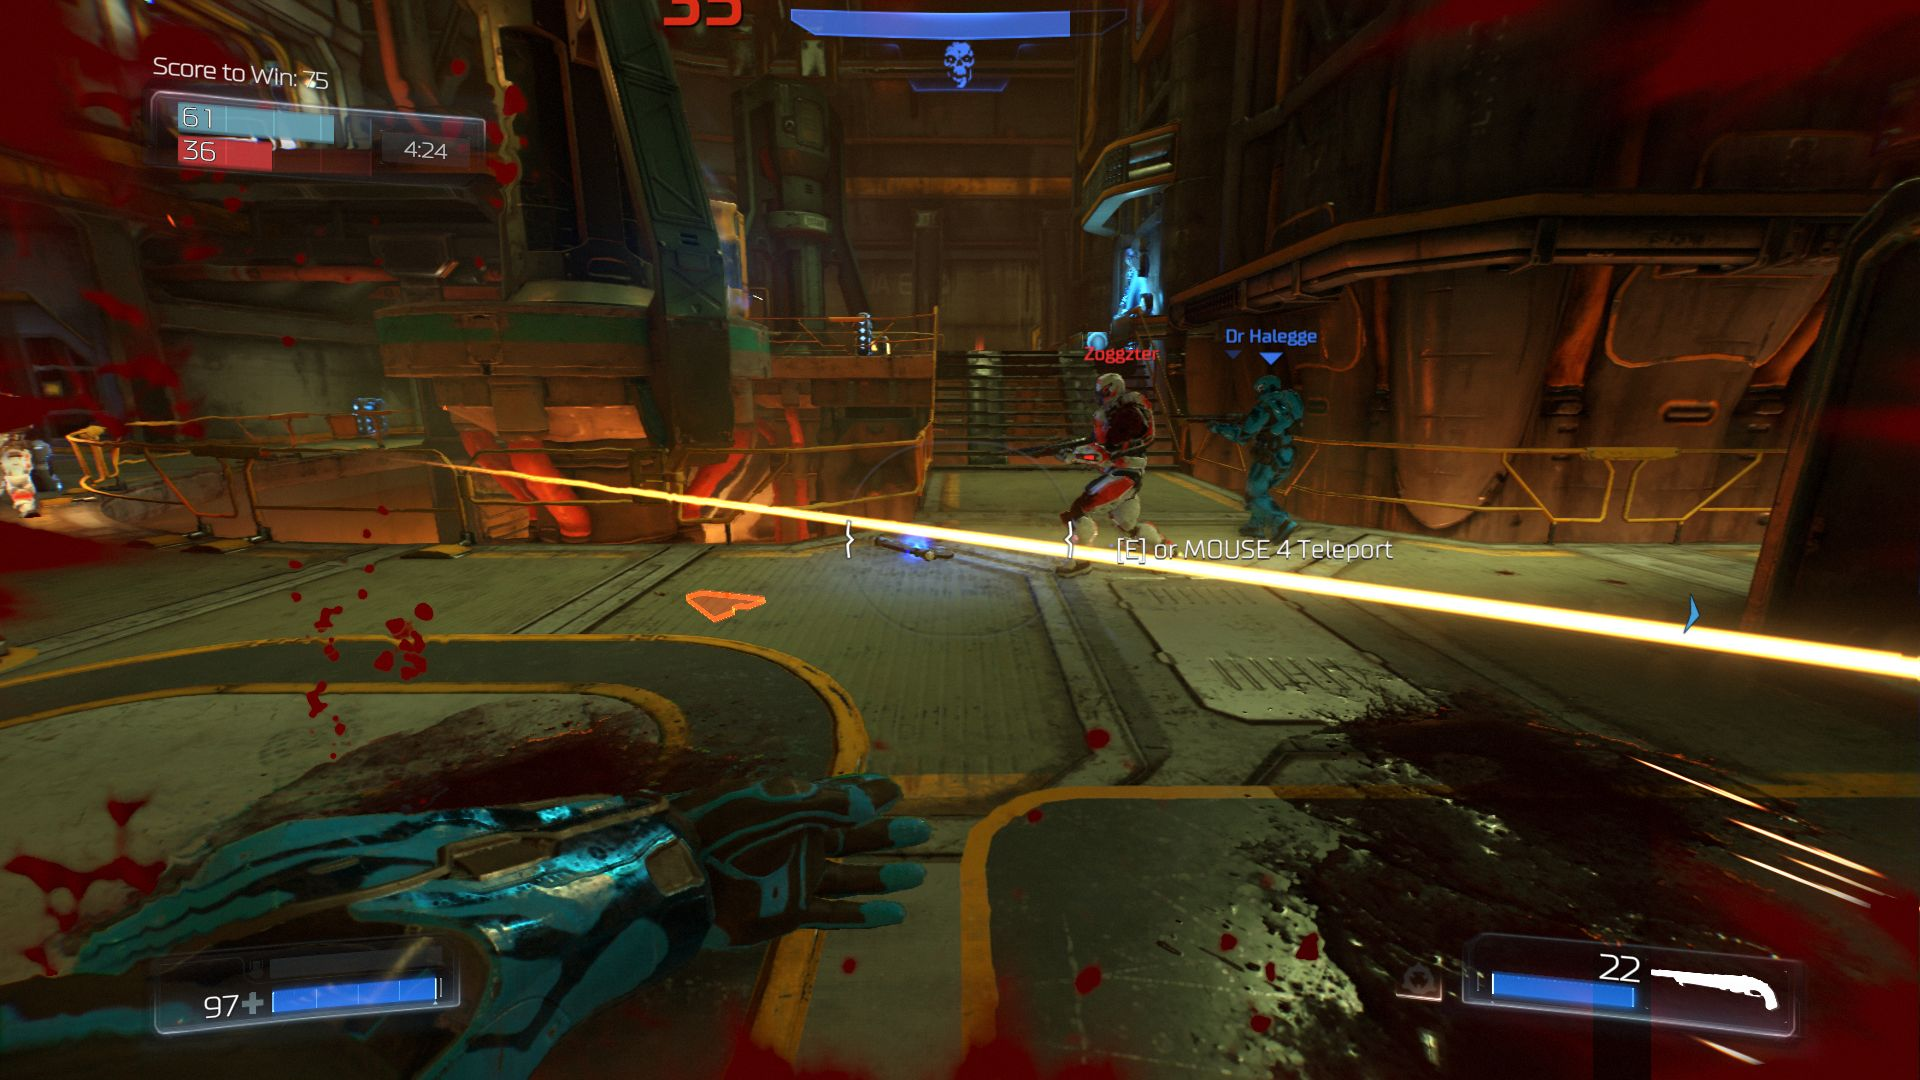 Doom Multiplayer Beta Preview